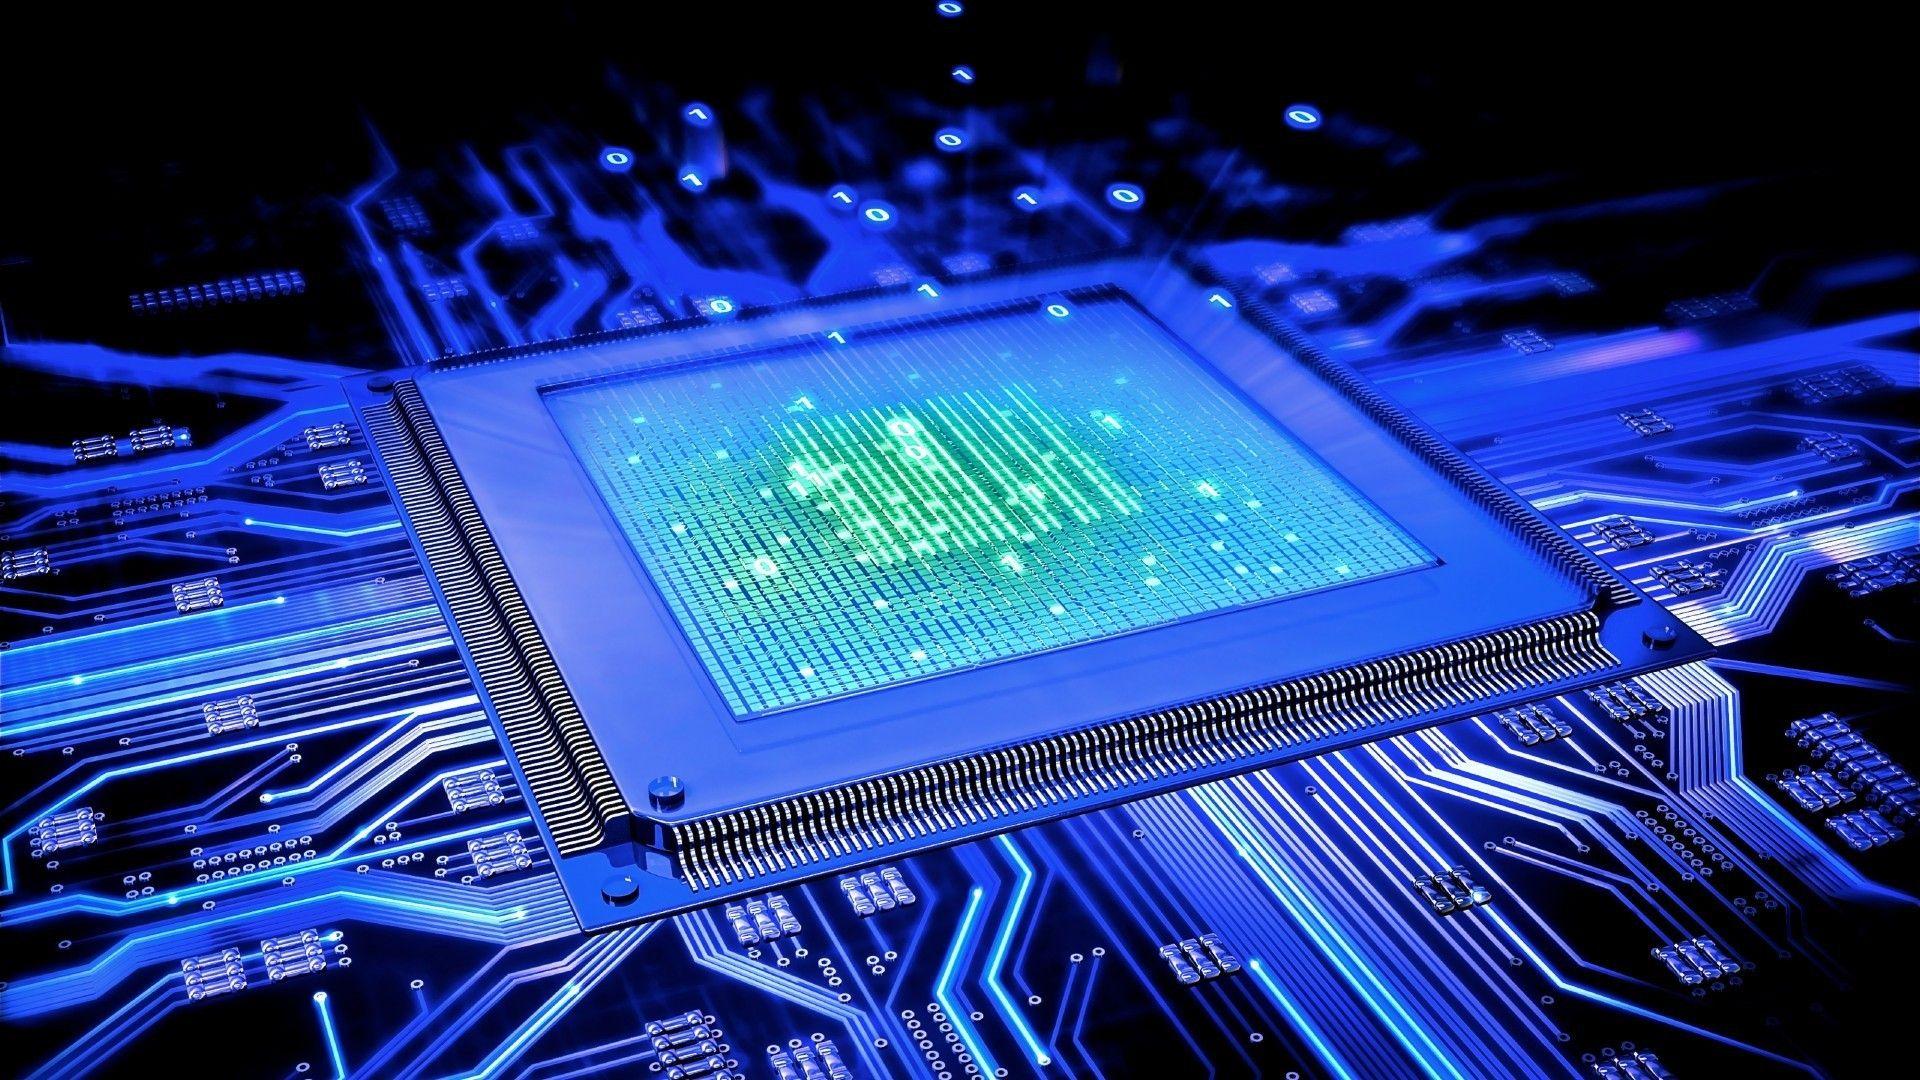 Drivers Download Teknologi Komputer Sains Komputer Komputer